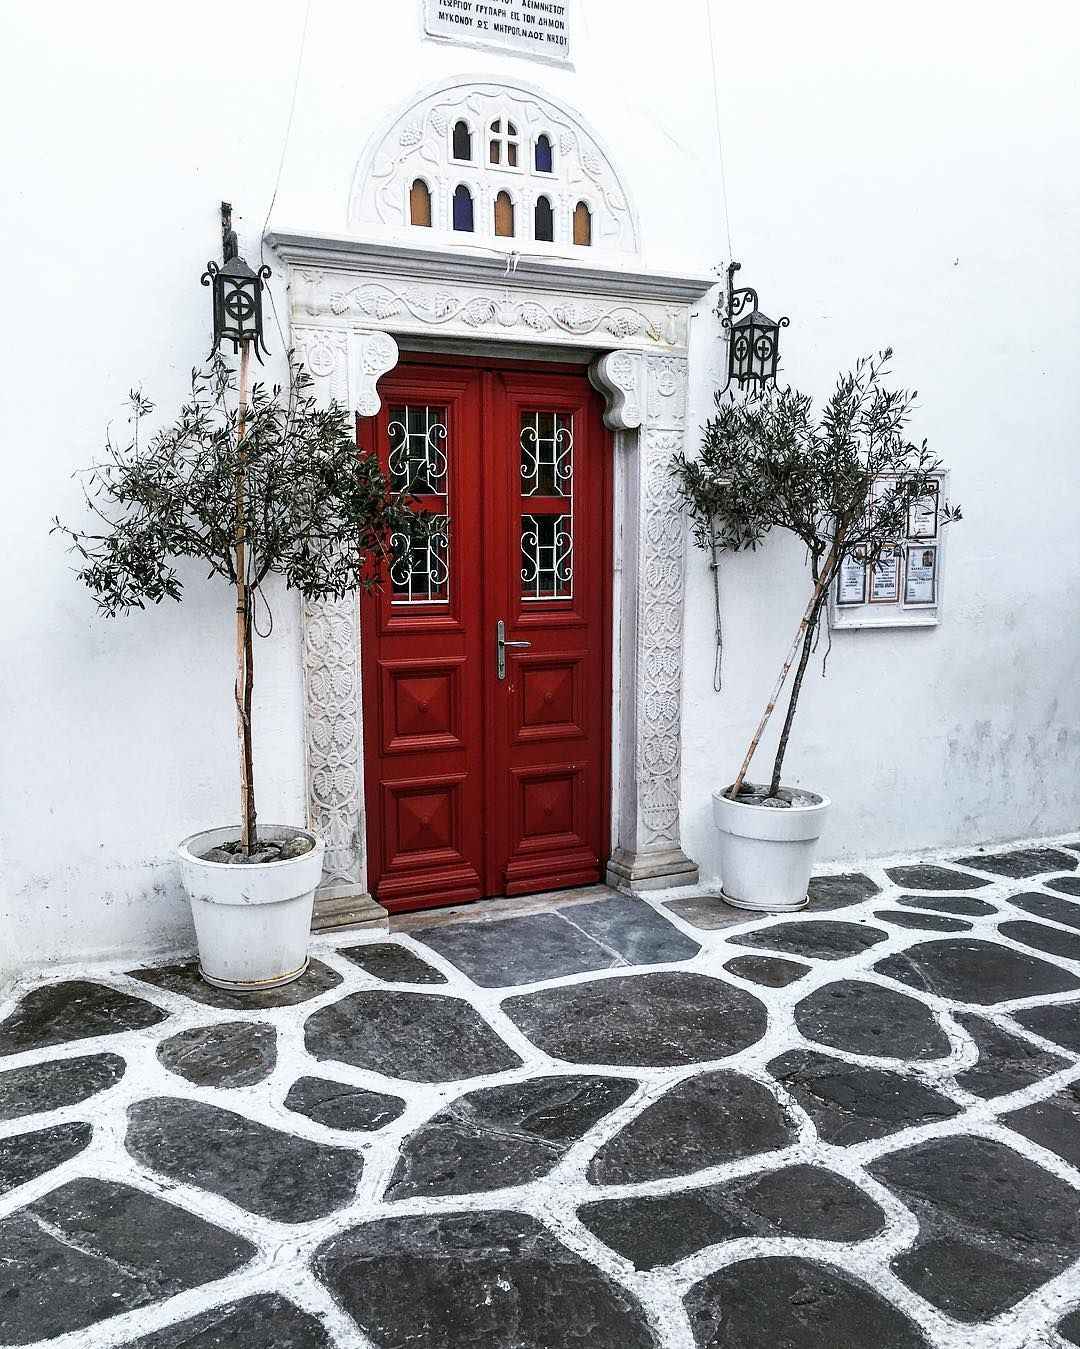 ~Crimson Door to God ~ #streetsofmykonos #daytripping #contrasts #thereissomecharmleft #blackandwhite #greeksummers #churches #doorways #travelsplendor ... & Crimson Door to God ~ #streetsofmykonos #daytripping #contrasts ...